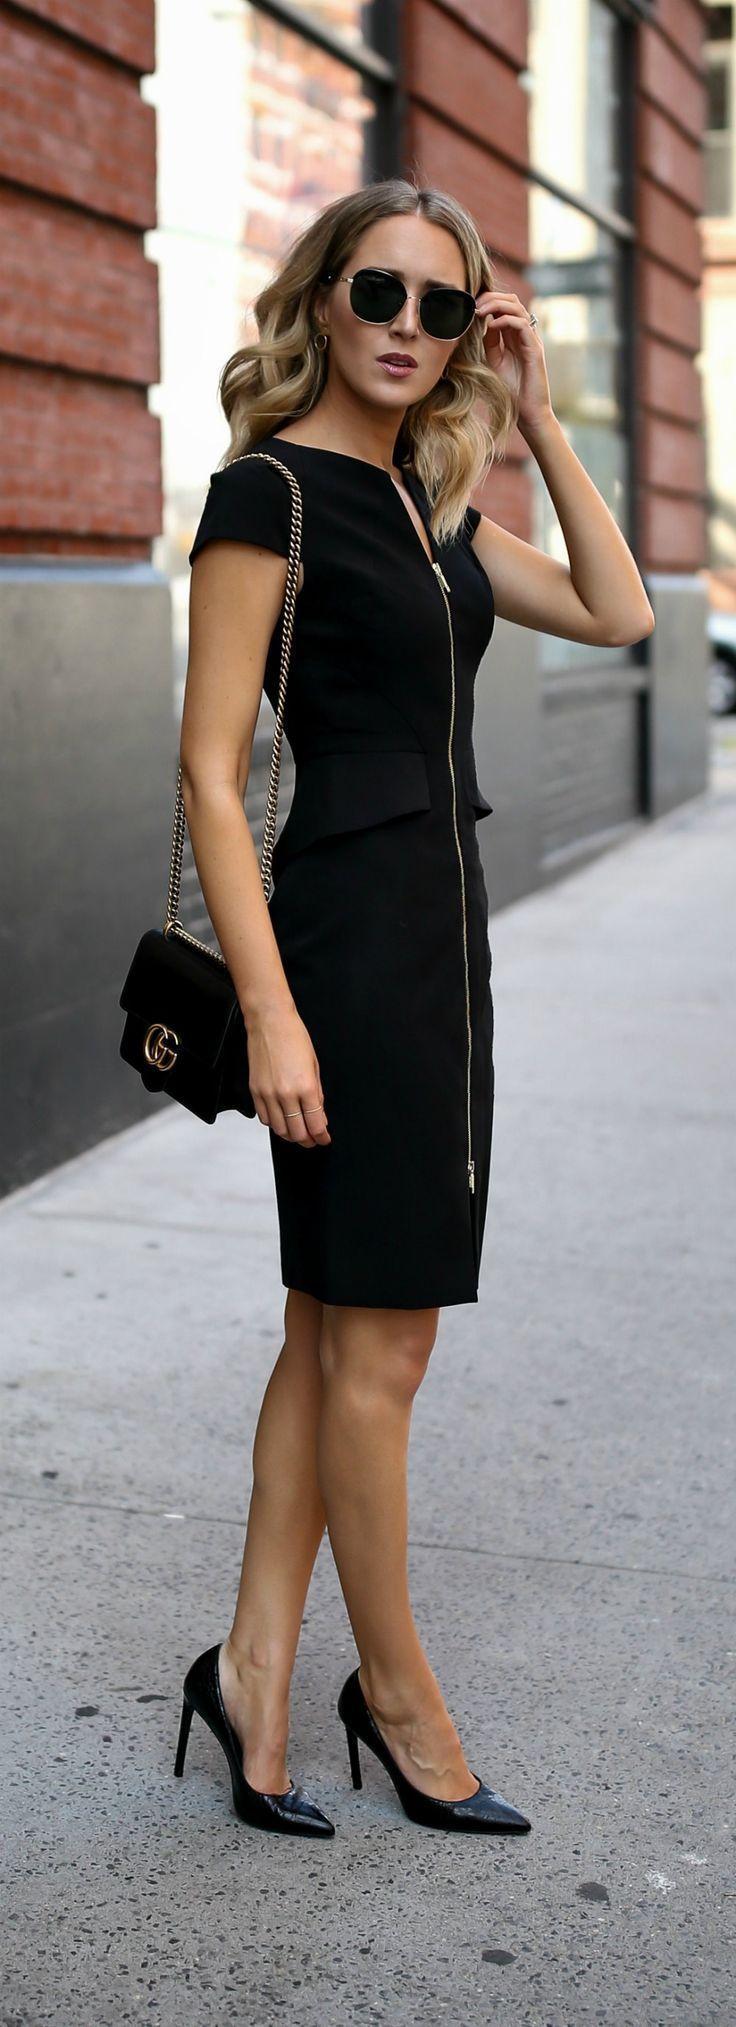 Classic Black Sheath // Black peplum front zip sheath dress, classic black  pumps,